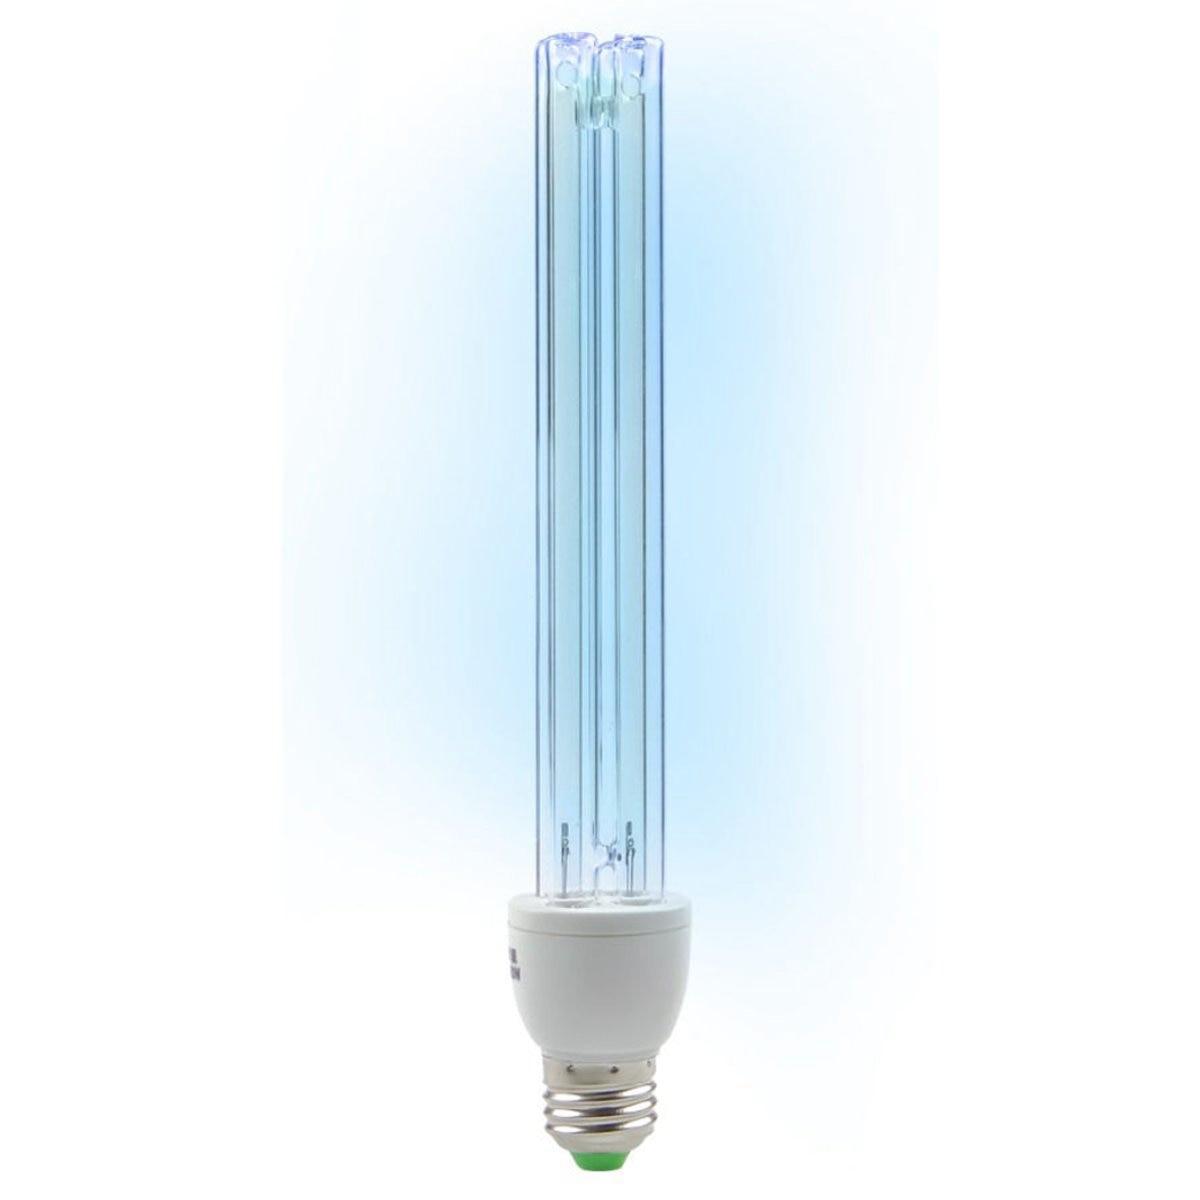 все цены на Ultraviolet UV Lamp Light Tube Bulb E27 20W AC220V UVC Disinfection Lamp Ozone Sterilization Mites Lights Germicidal Lamp Bulb